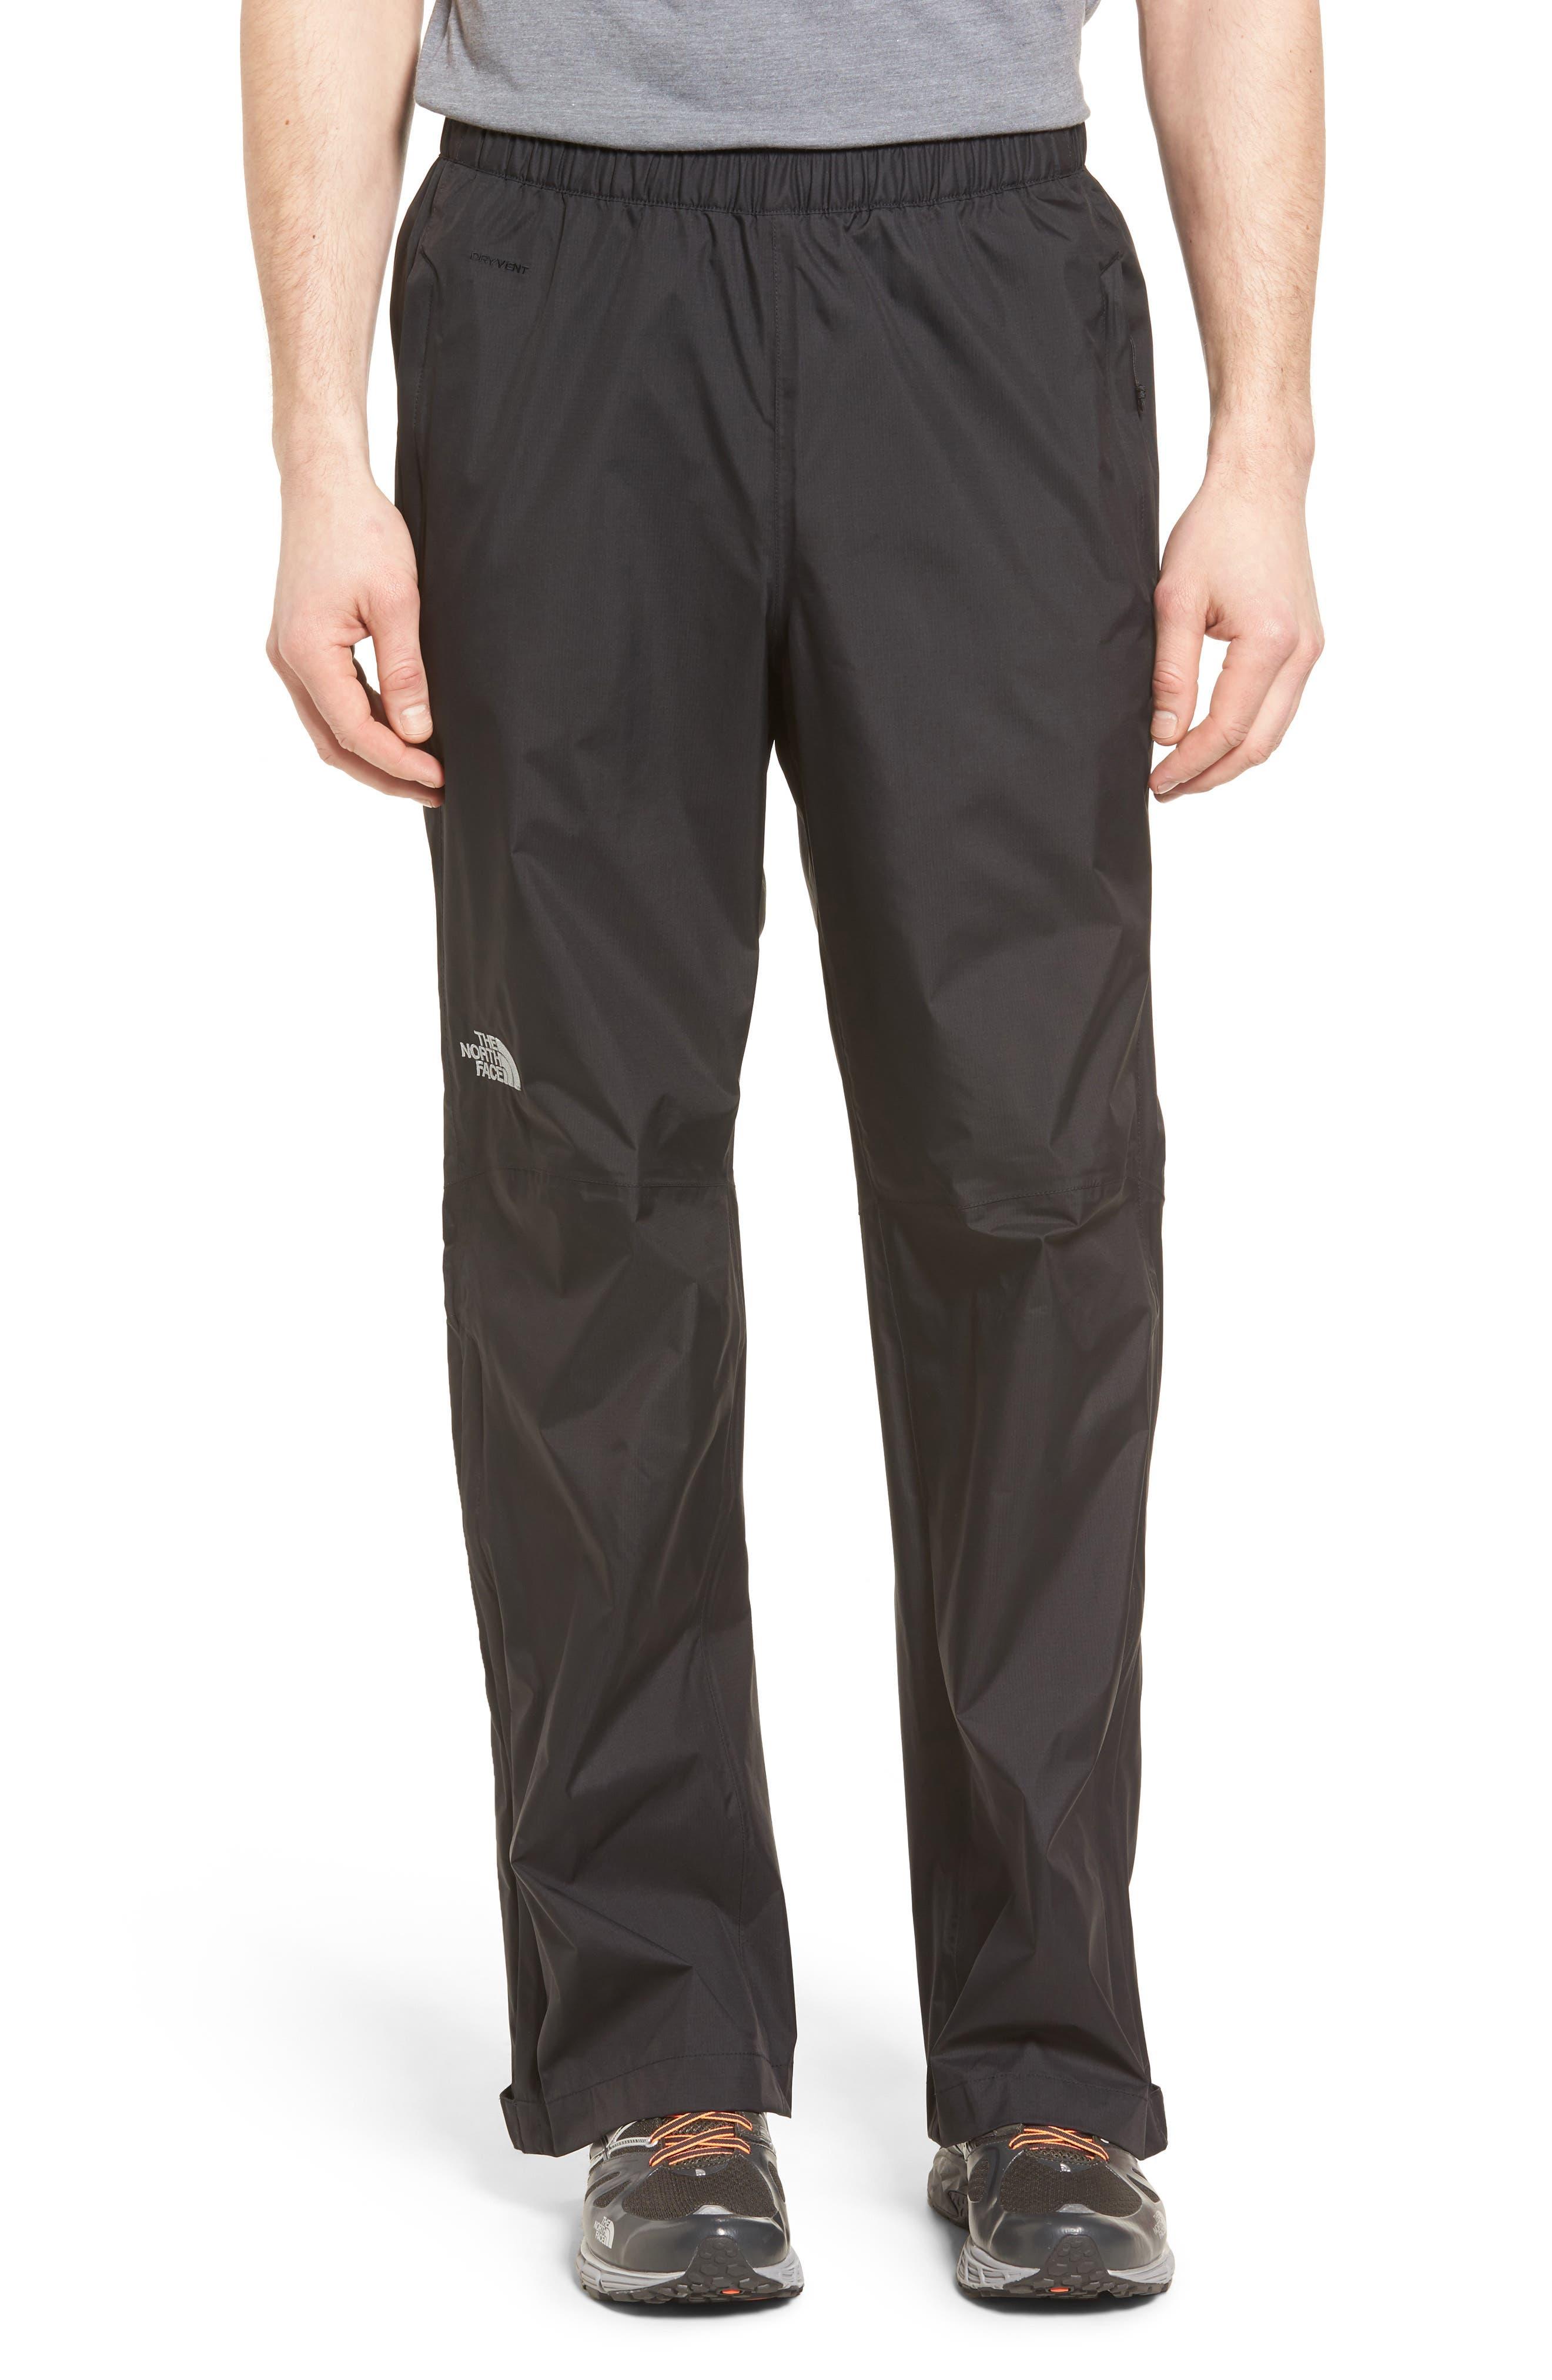 The North Face Venture Waterproof Pants